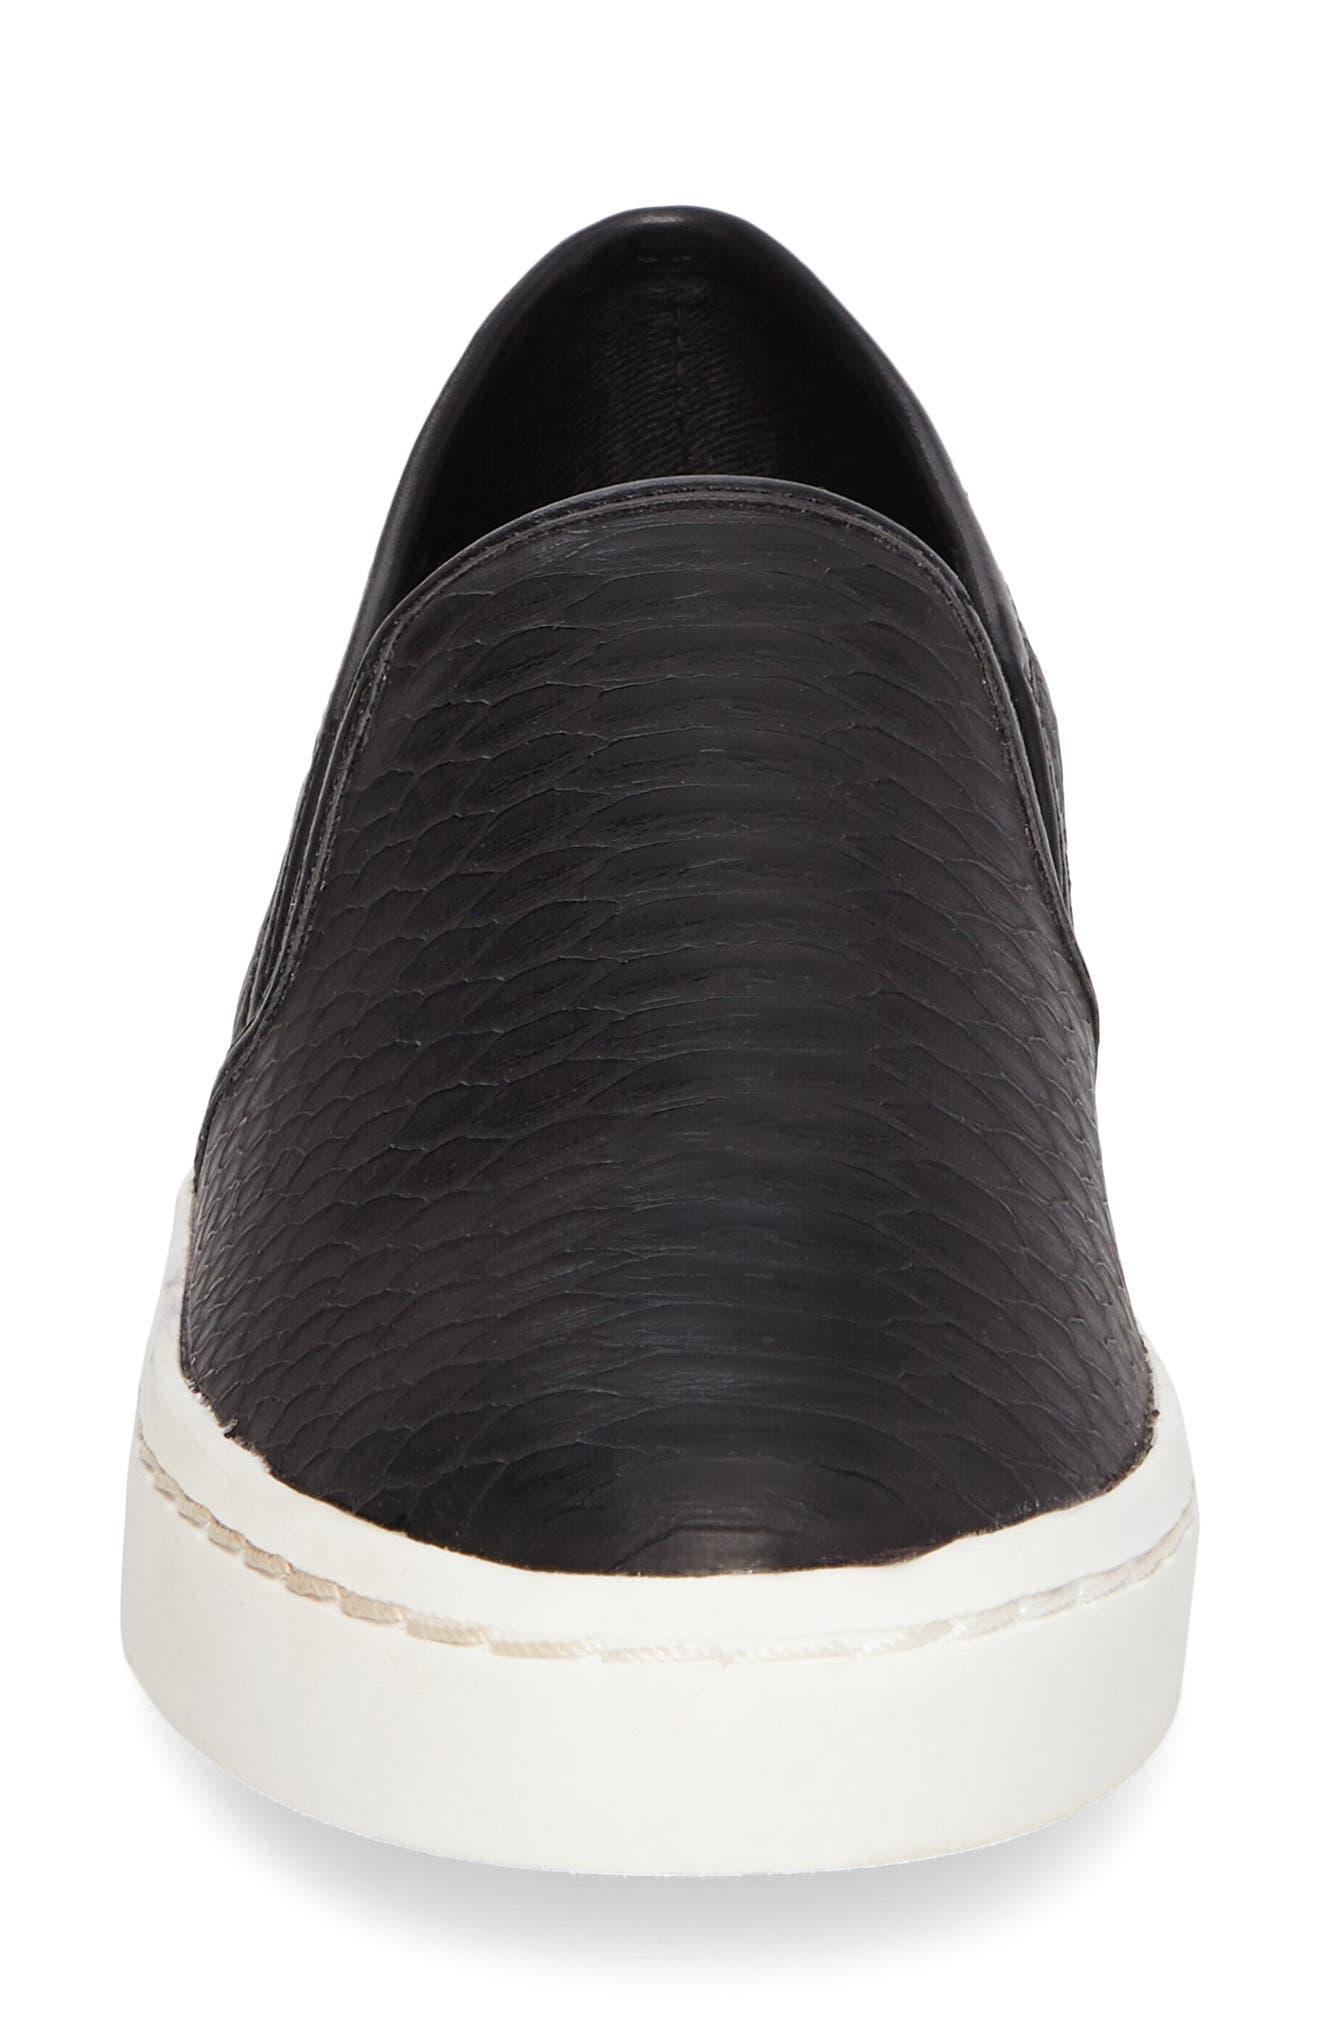 'Twiny' Slip-On Sneaker,                             Alternate thumbnail 4, color,                             005